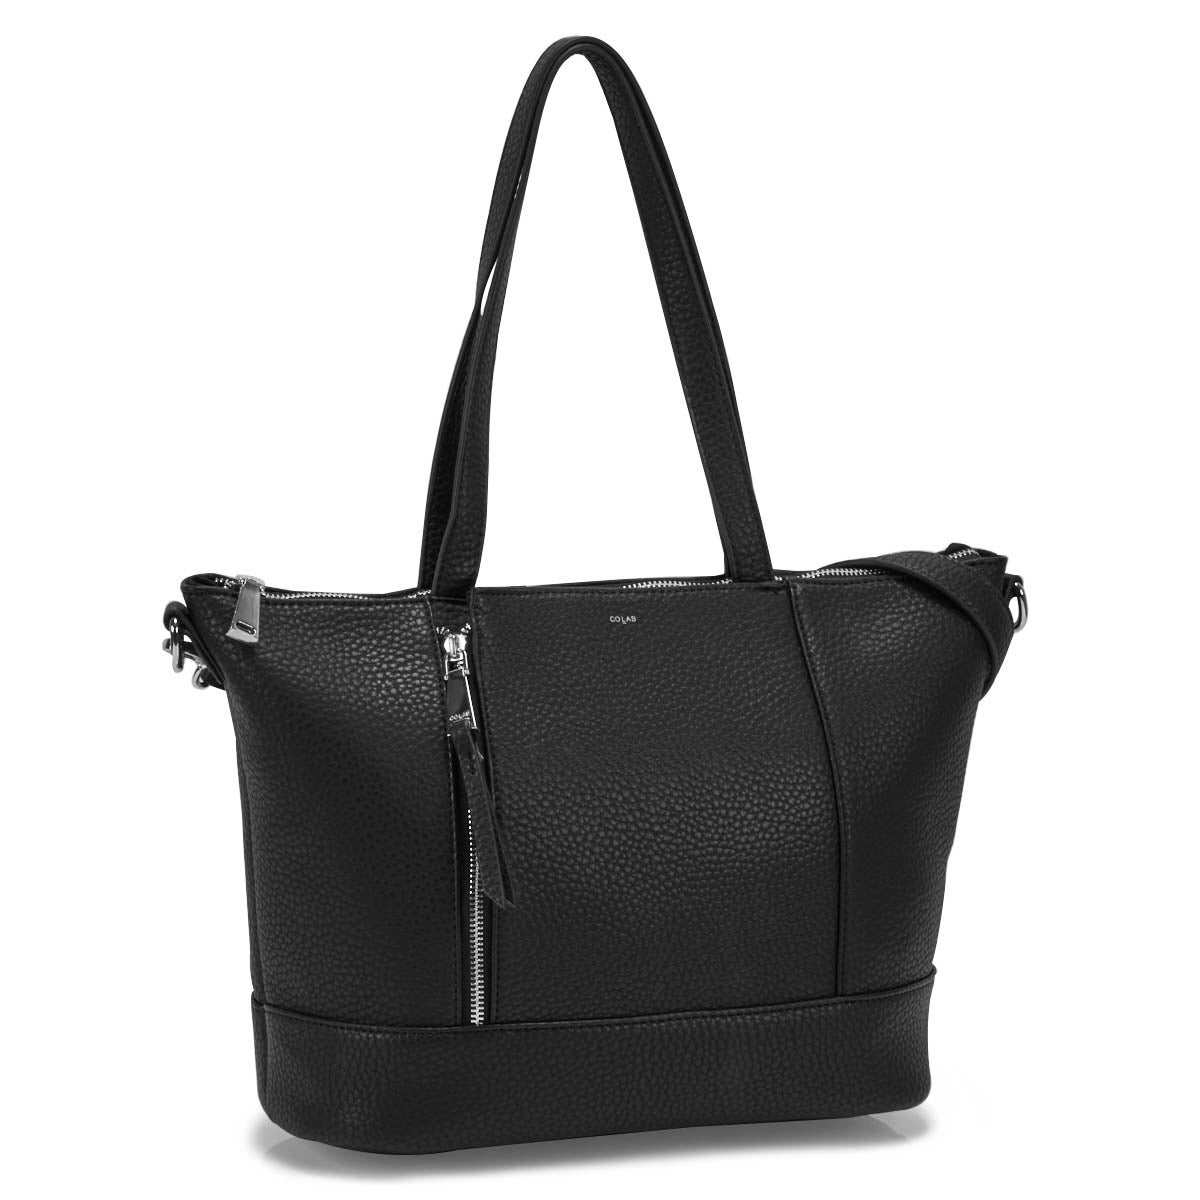 Lds black top zip large tote bag